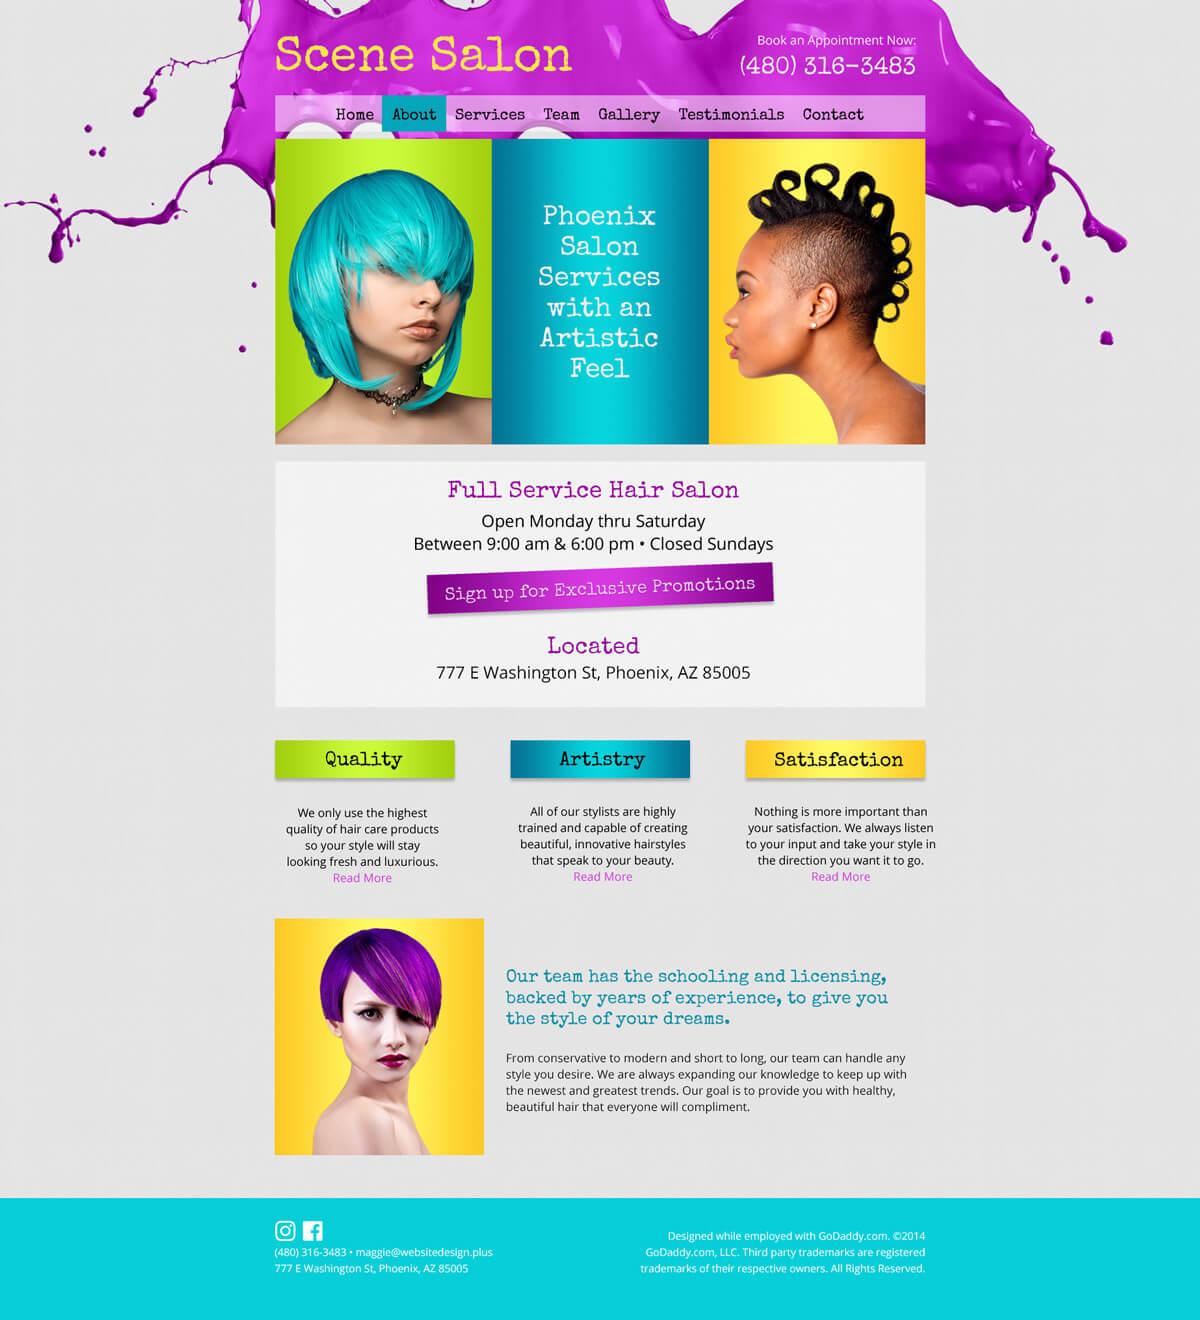 edgy salon web design mockup